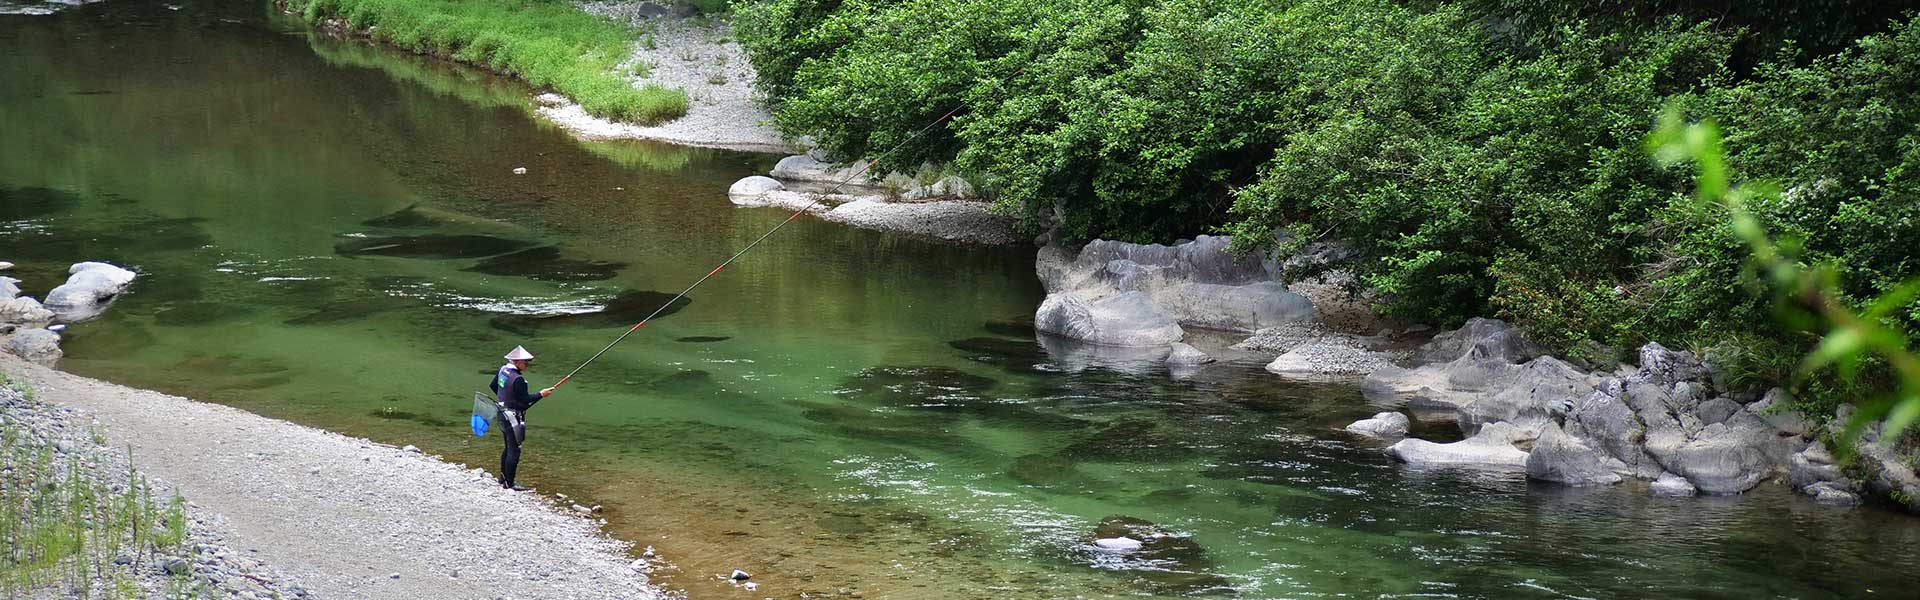 Sweetfish 'Ayu' Fishing